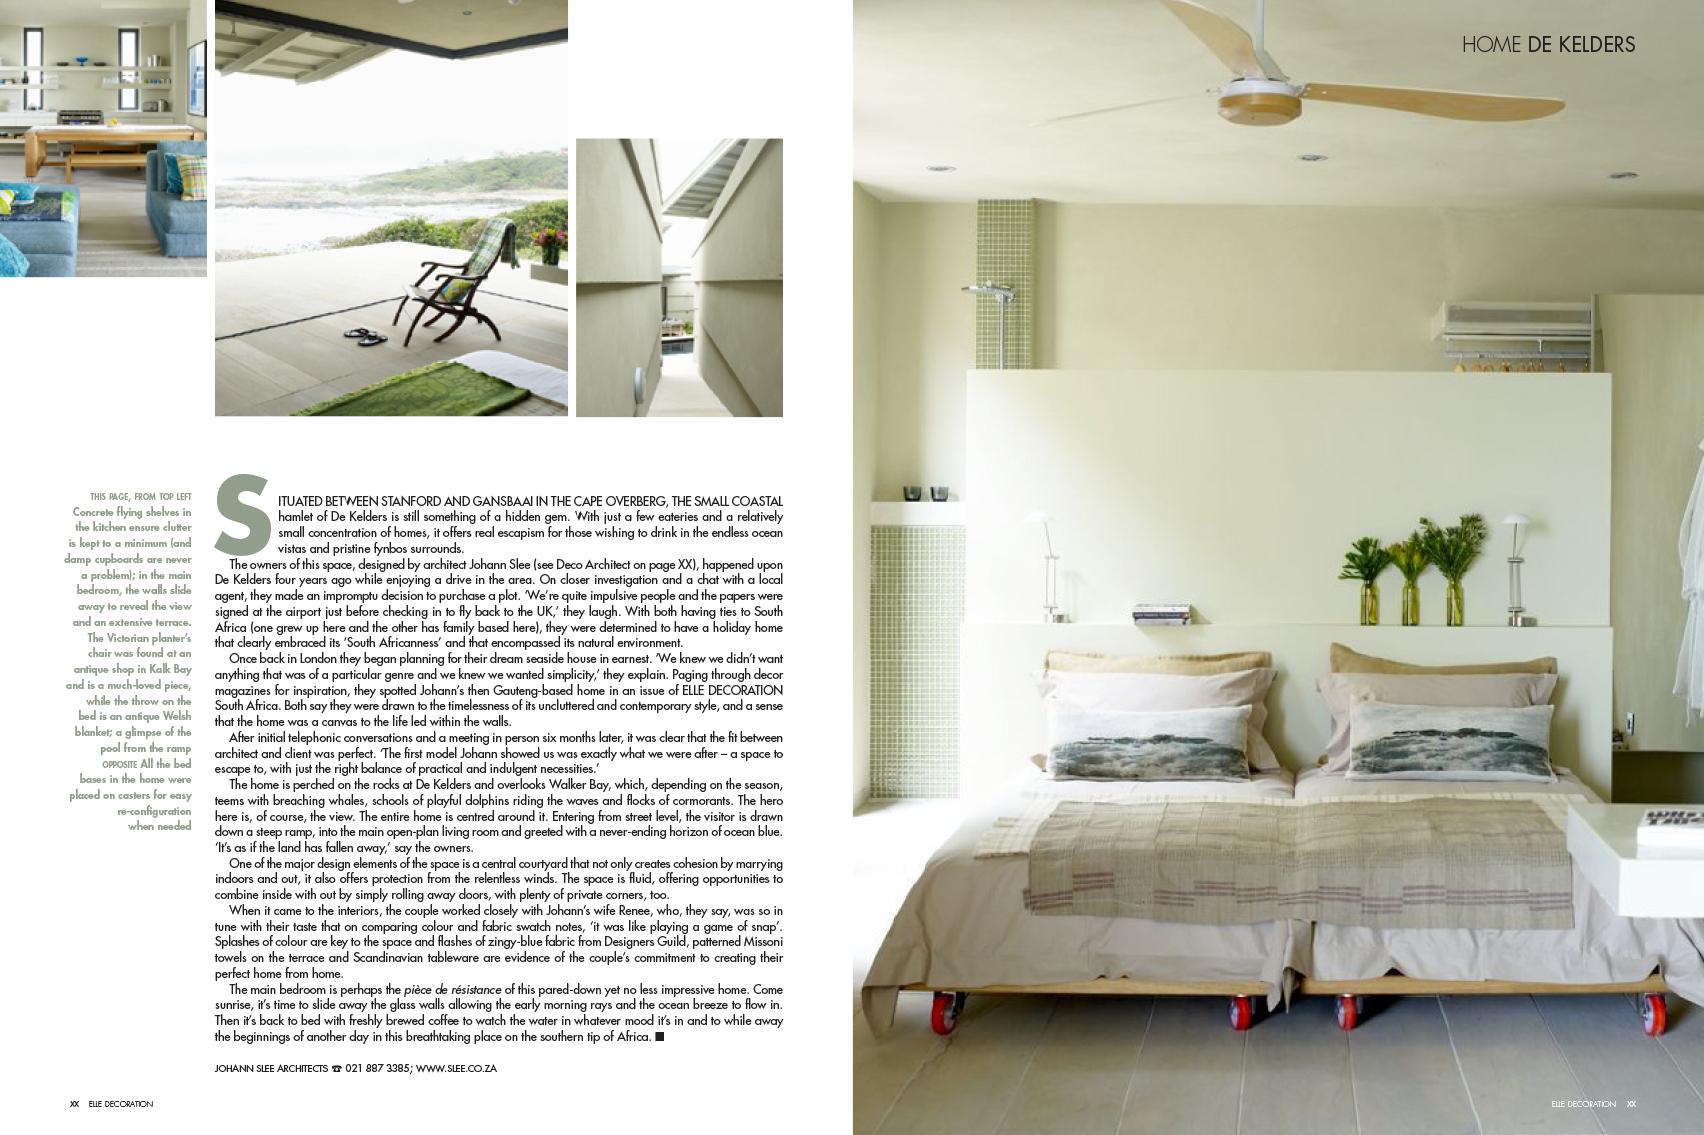 De-Kelders-house-Elle-p3.jpg